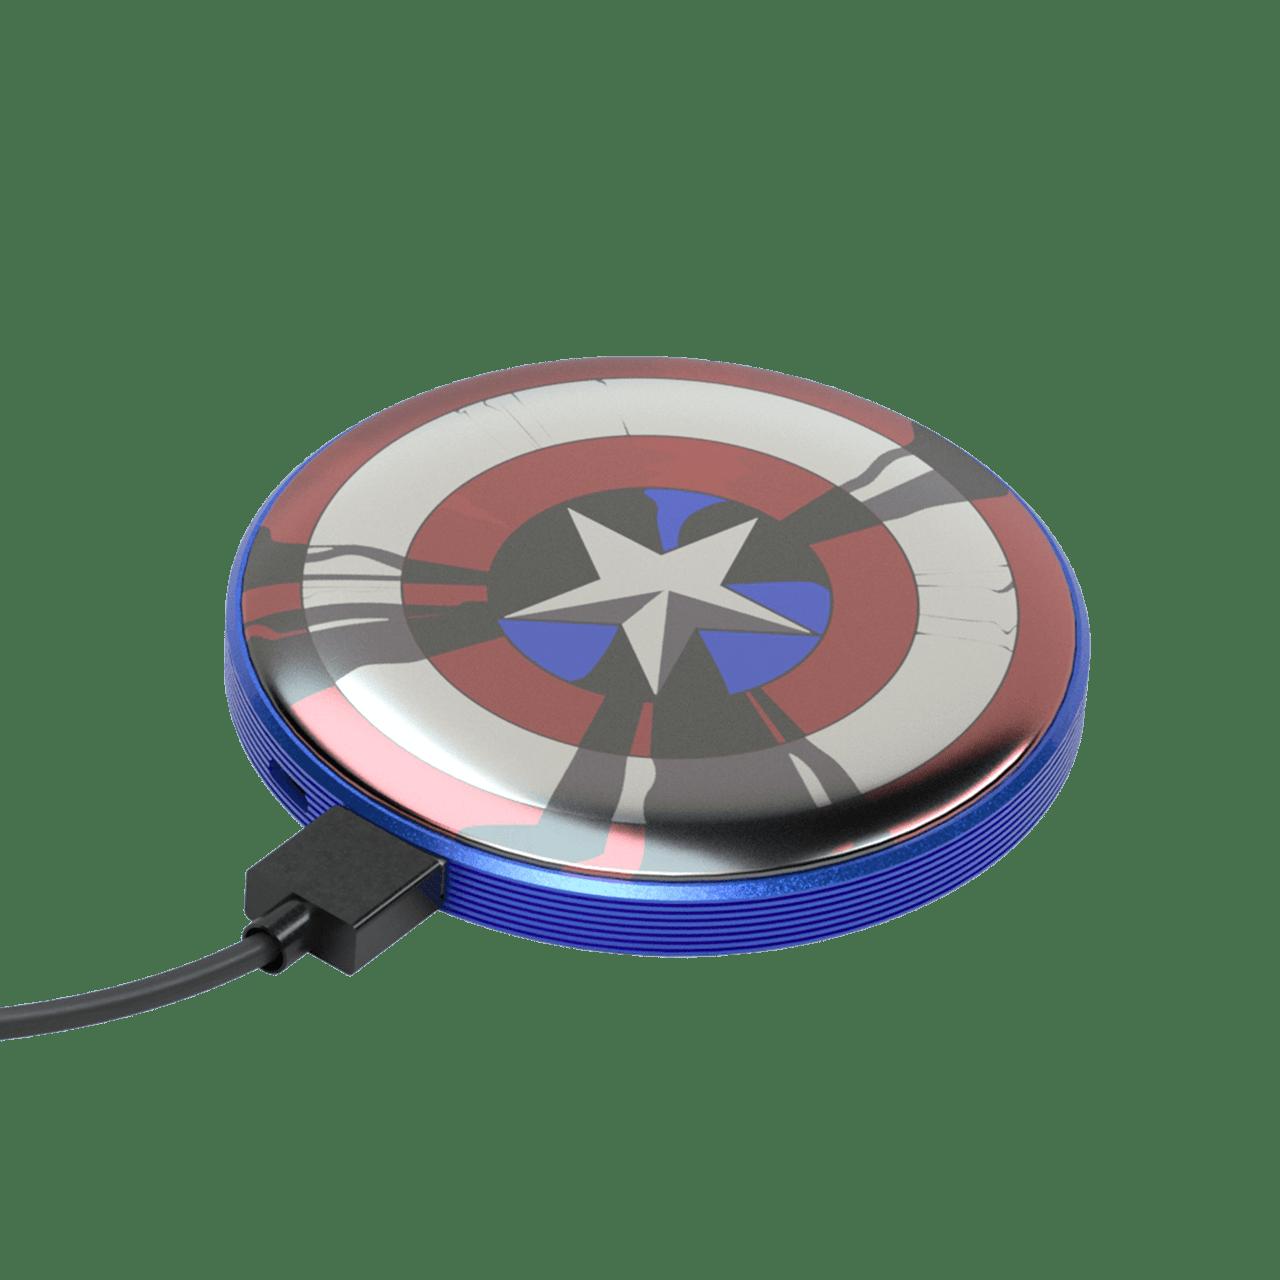 Tribe Marvel Captain America 4000mAh Light Up Power Bank - 1